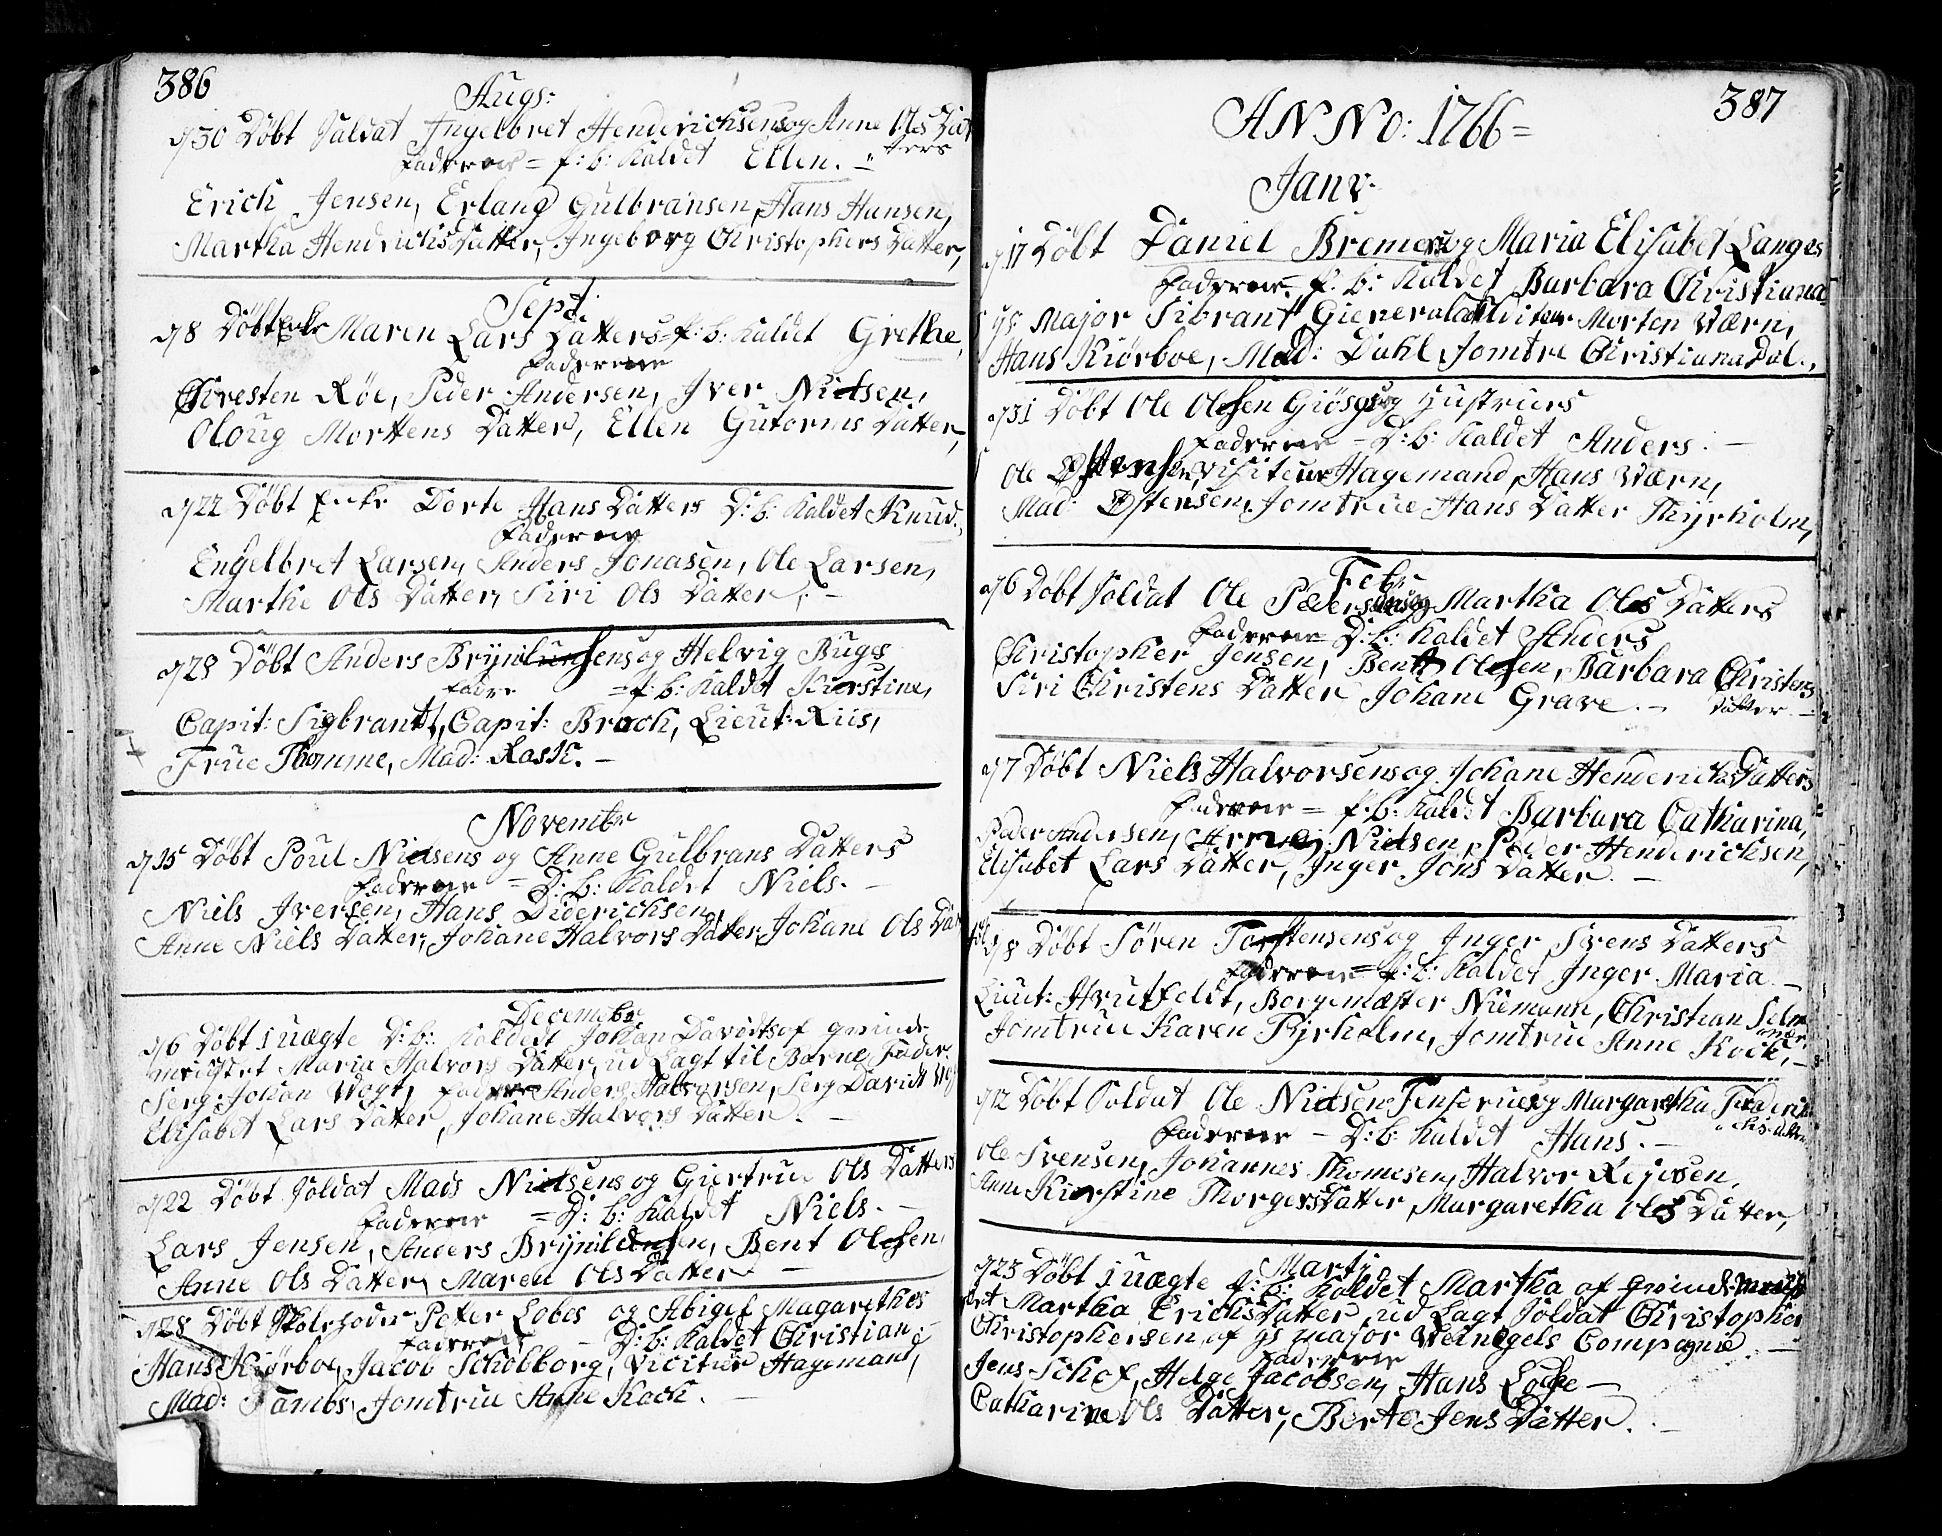 SAO, Fredrikstad prestekontor Kirkebøker, F/Fa/L0002: Parish register (official) no. 2, 1750-1804, p. 386-387